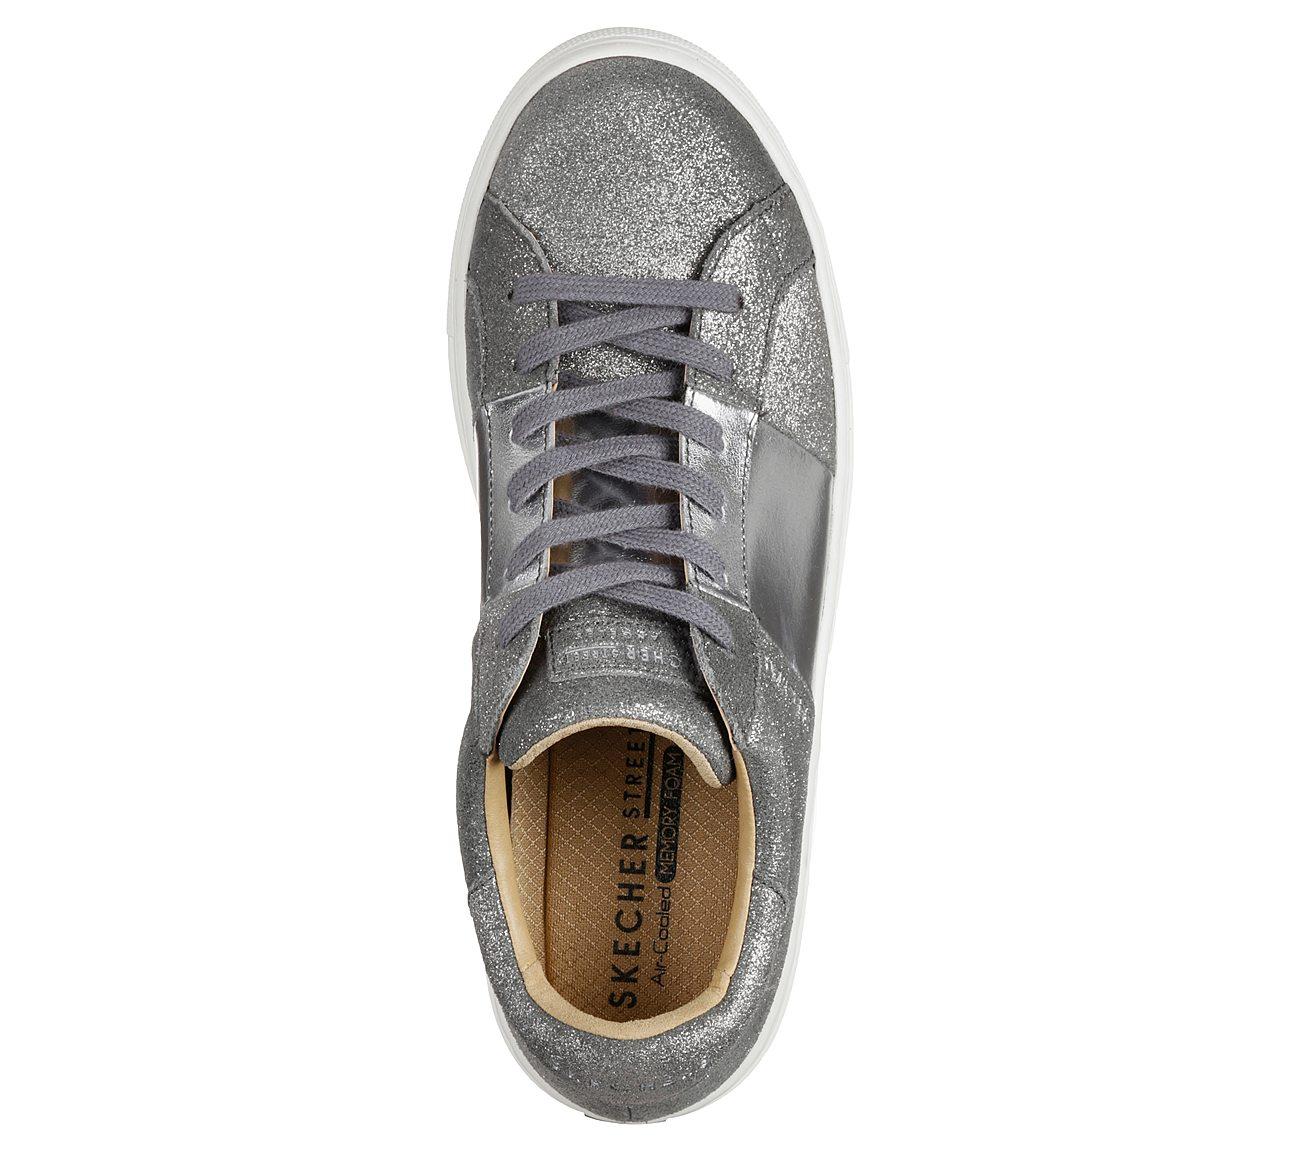 Banded SKECHER Street Shoes